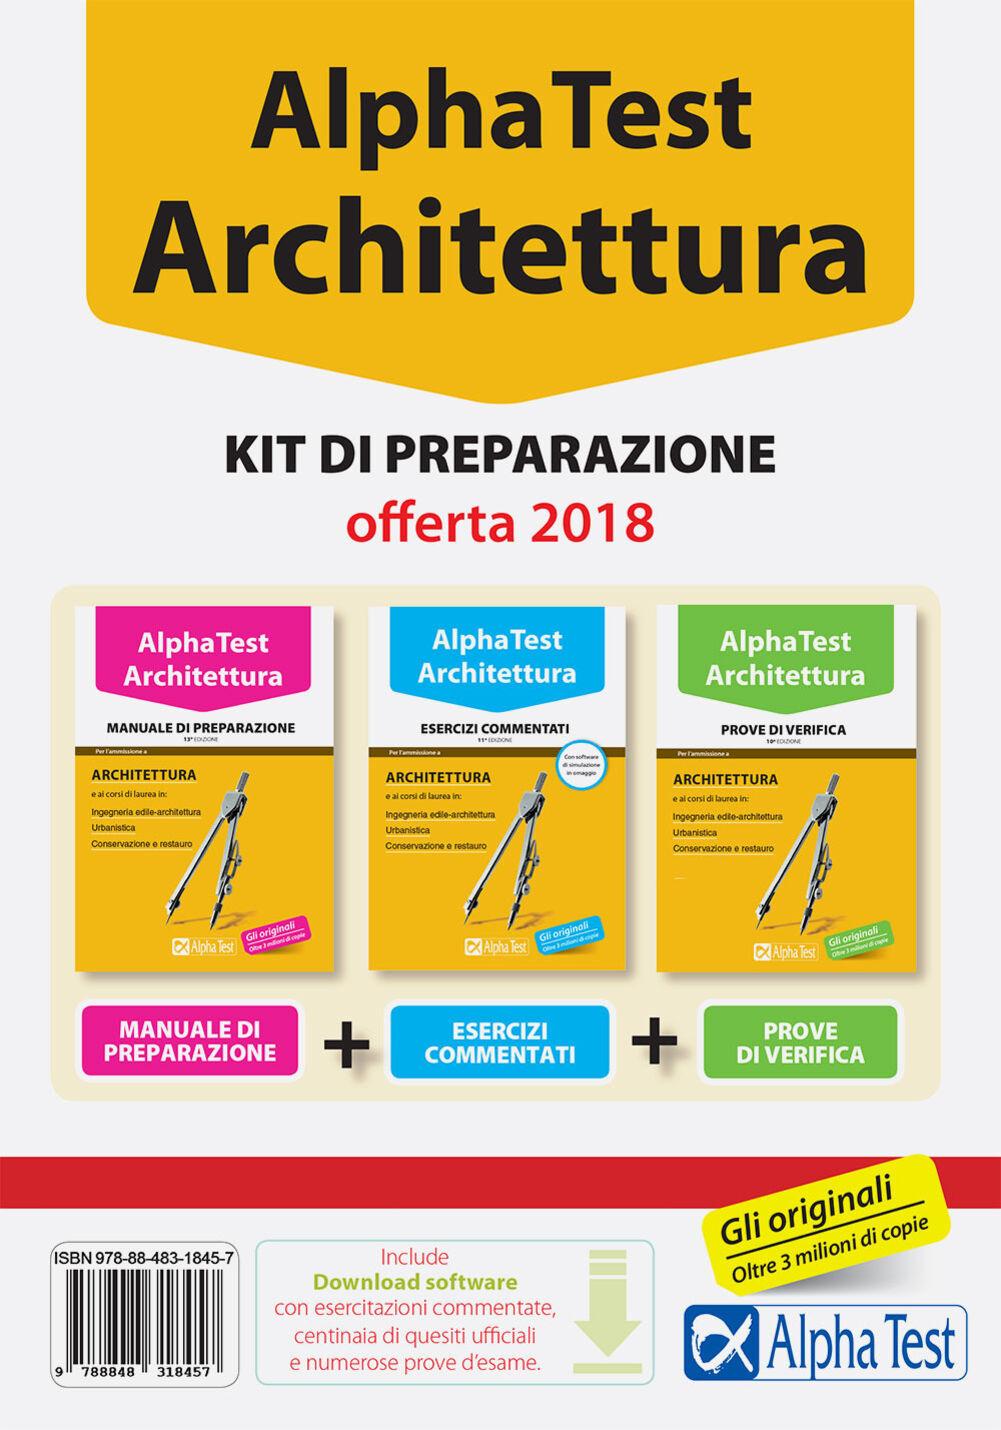 Alpha Test Architettura kit di preparazione 2017